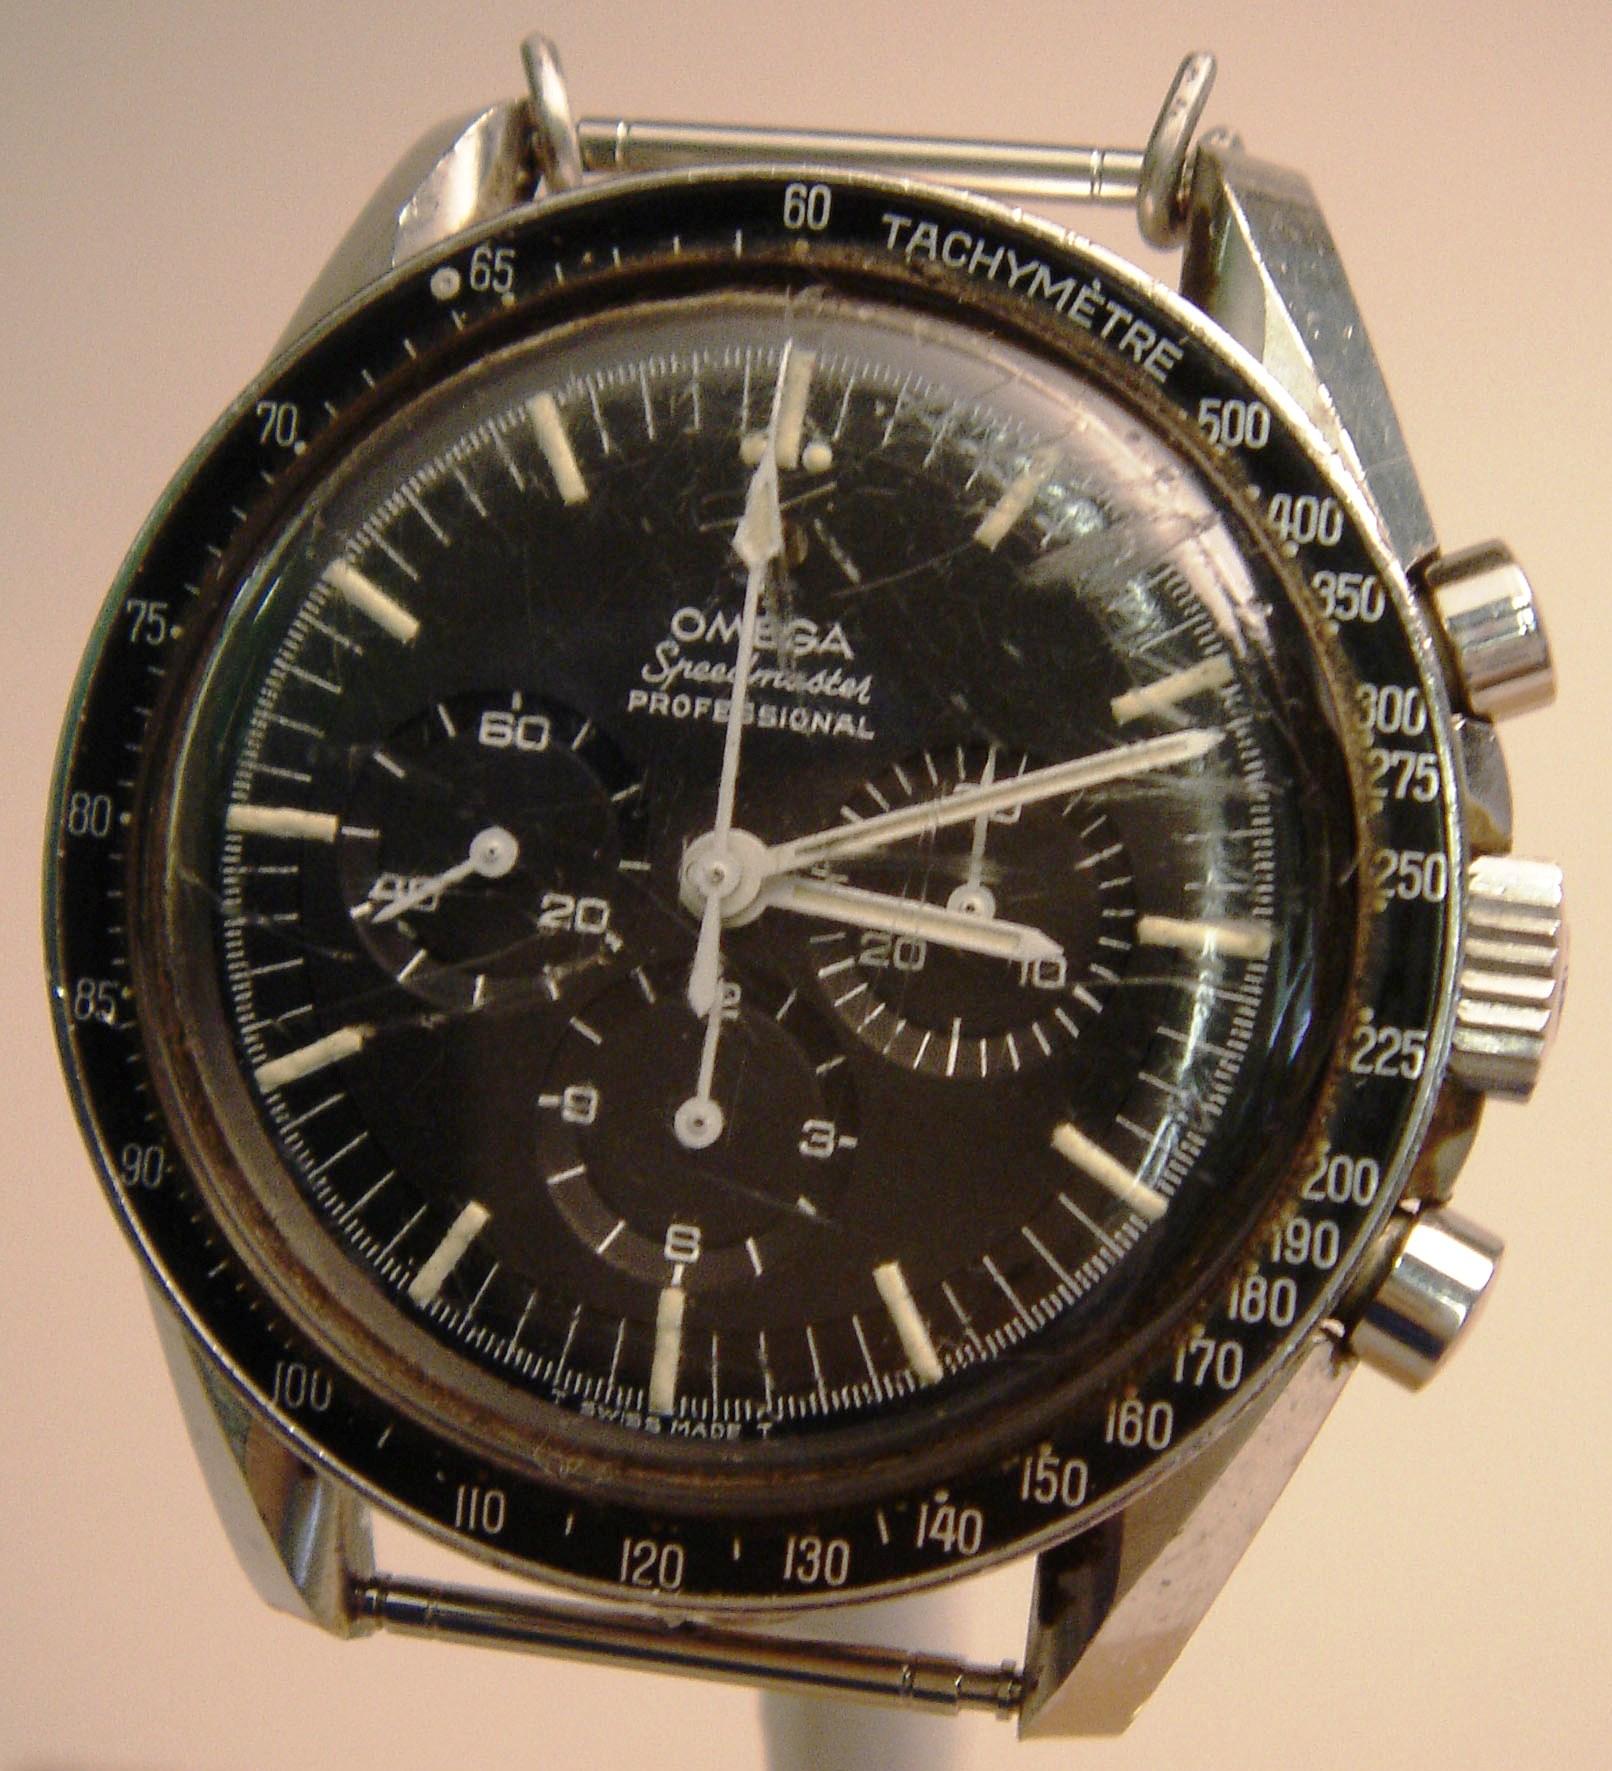 Frank Borman's chronograph